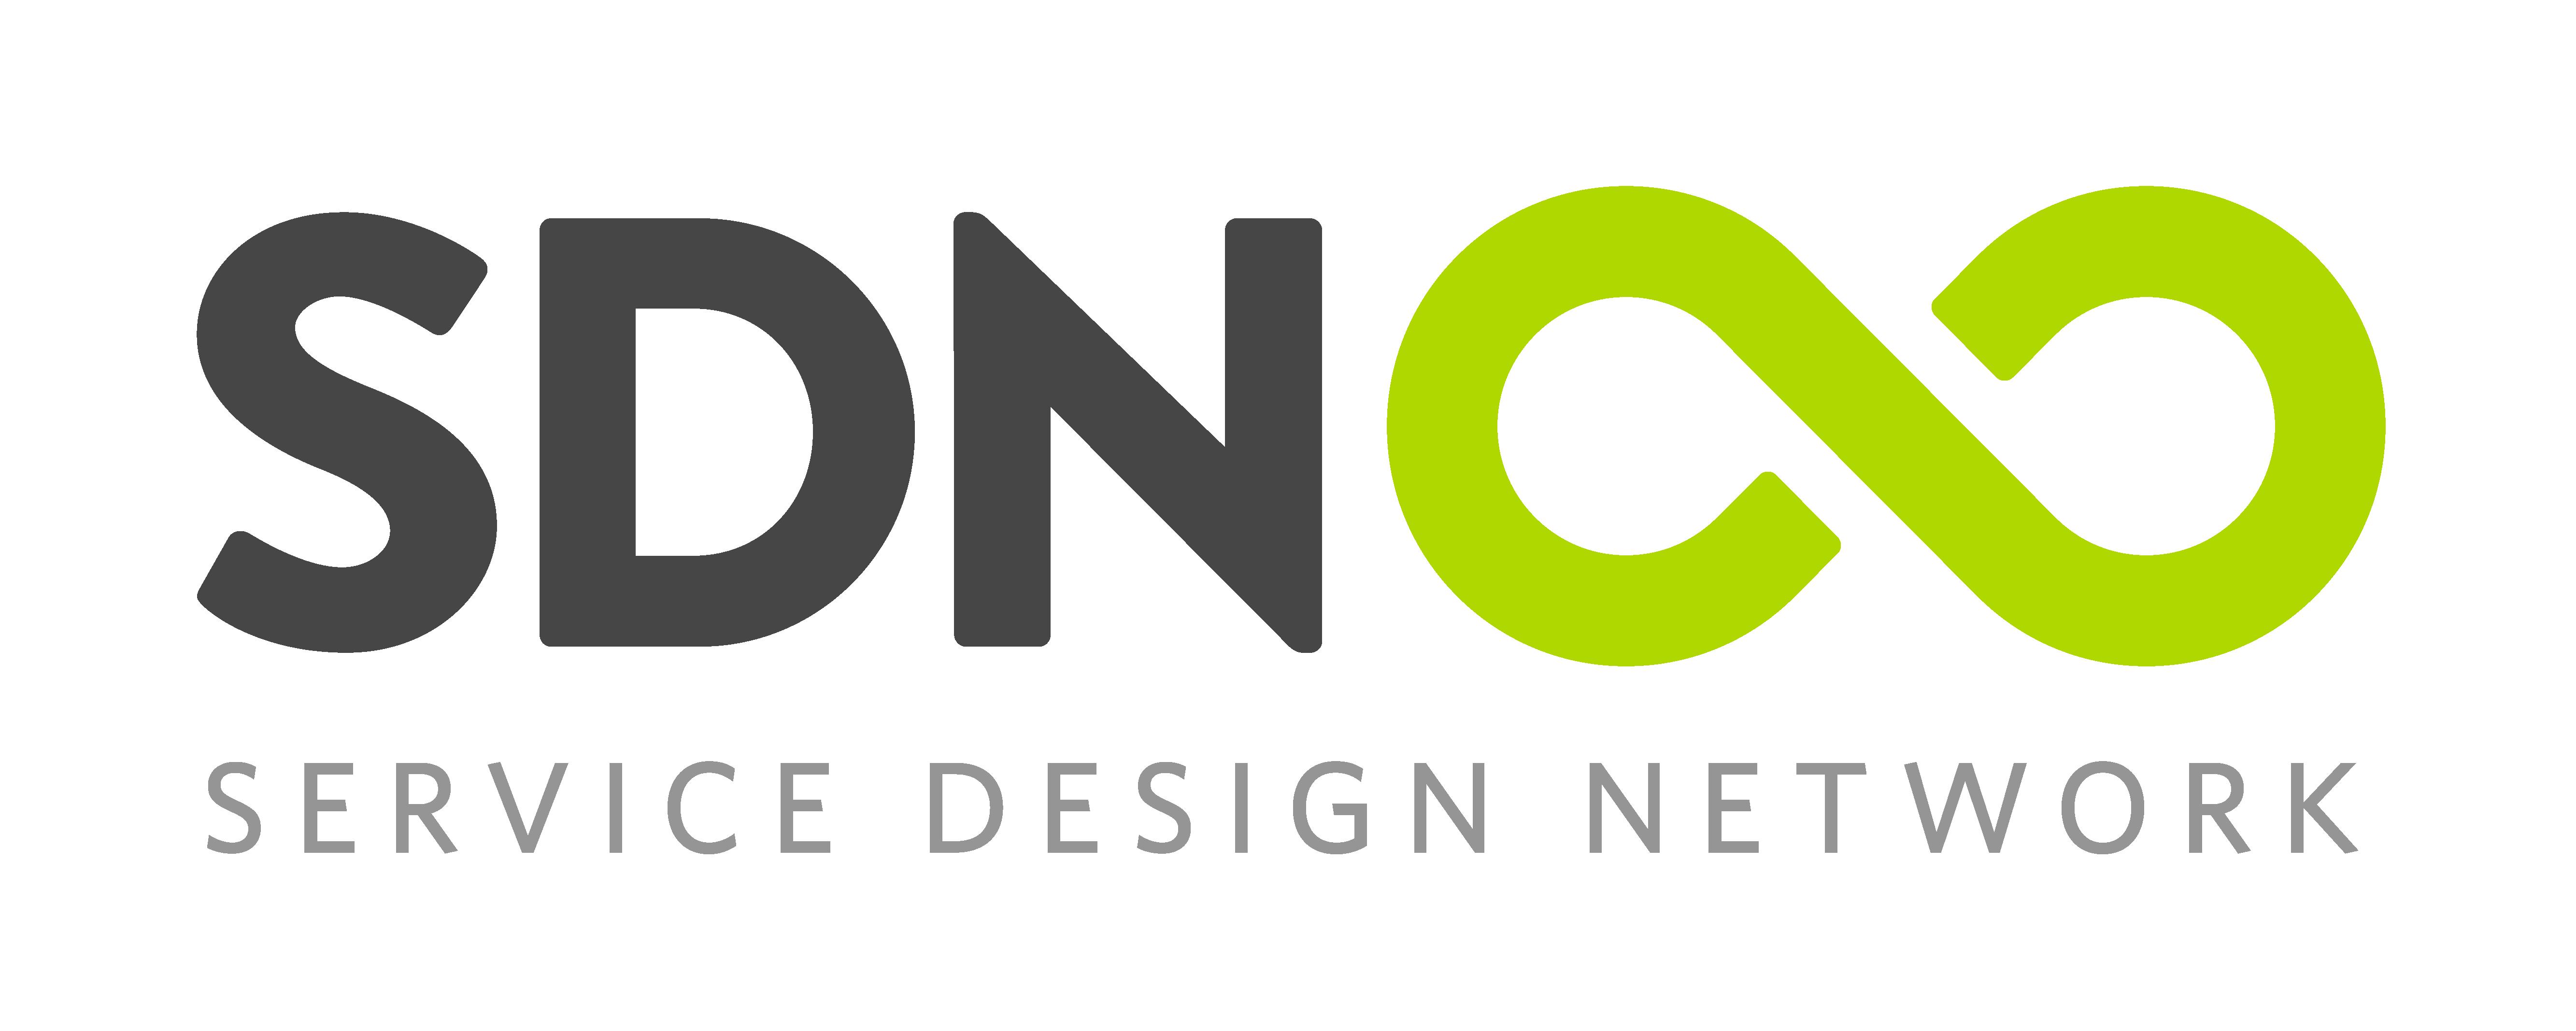 SDN_logo_RGB_for-white-bg.png#asset:409